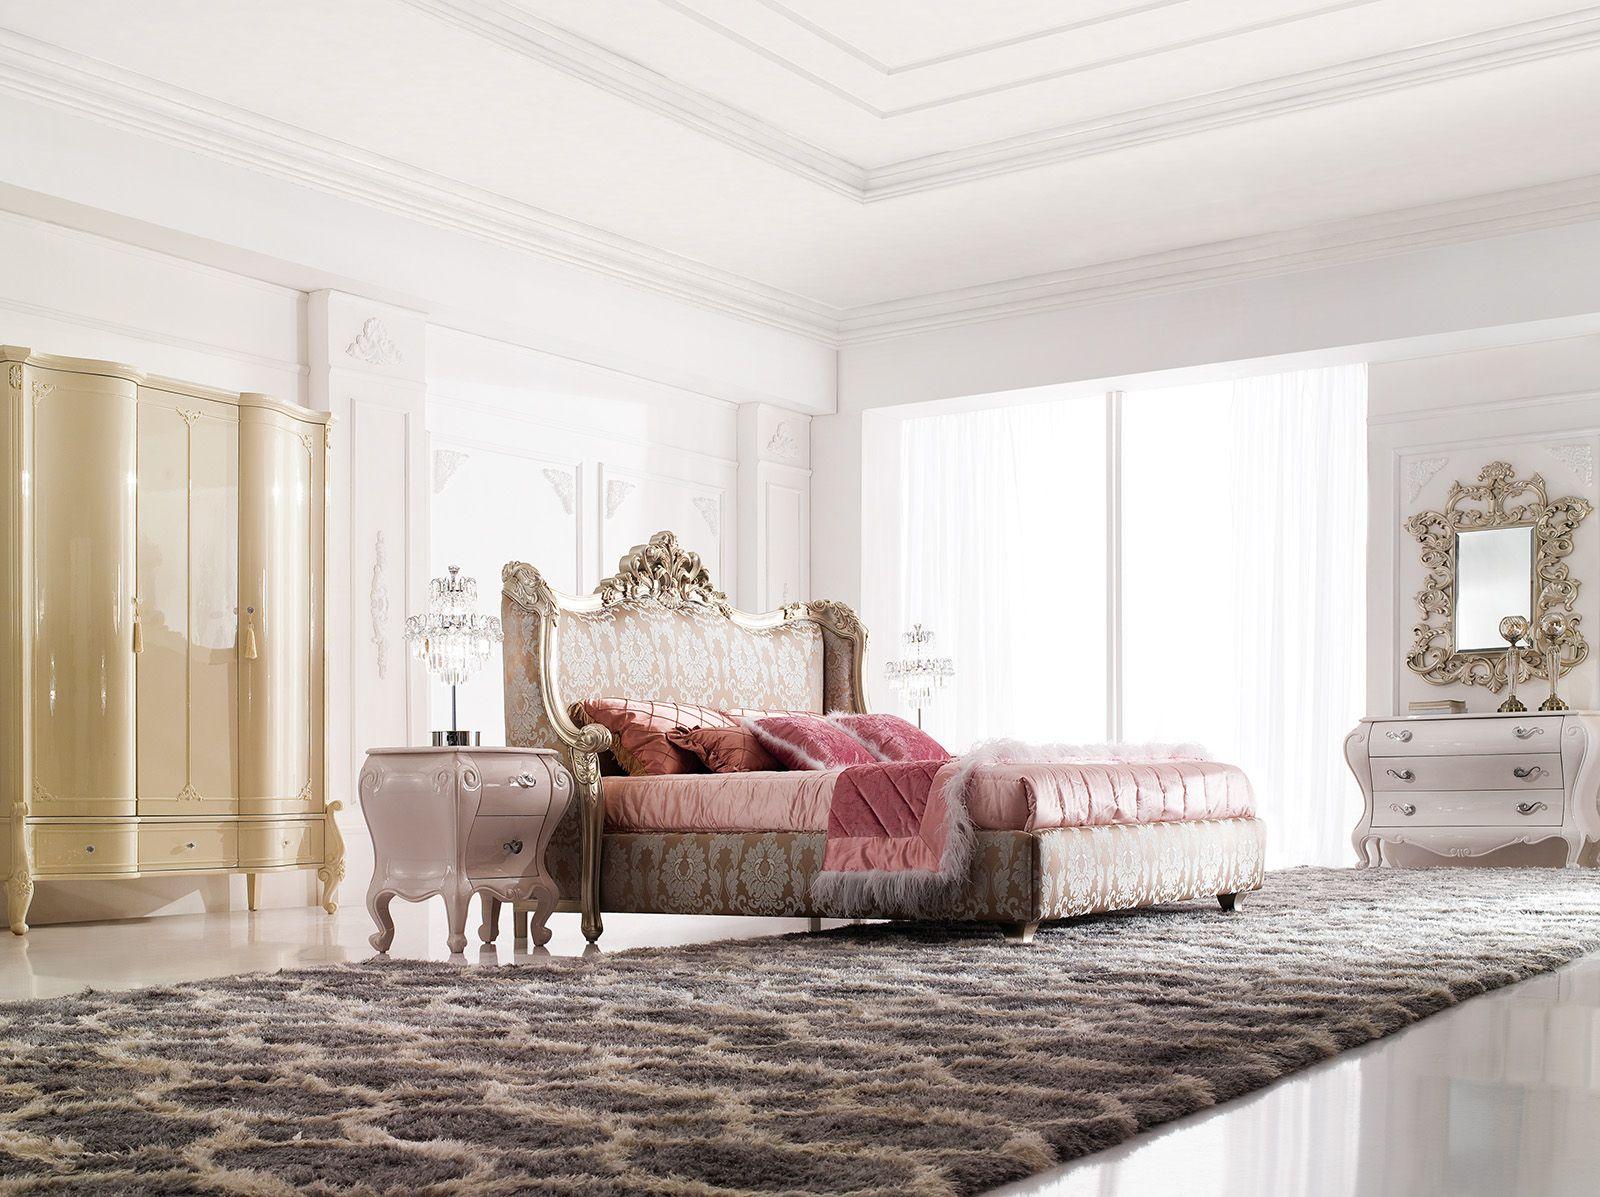 Bedrooms by design alhuzaifa luxuryfurniture uae decor for Home decor uae